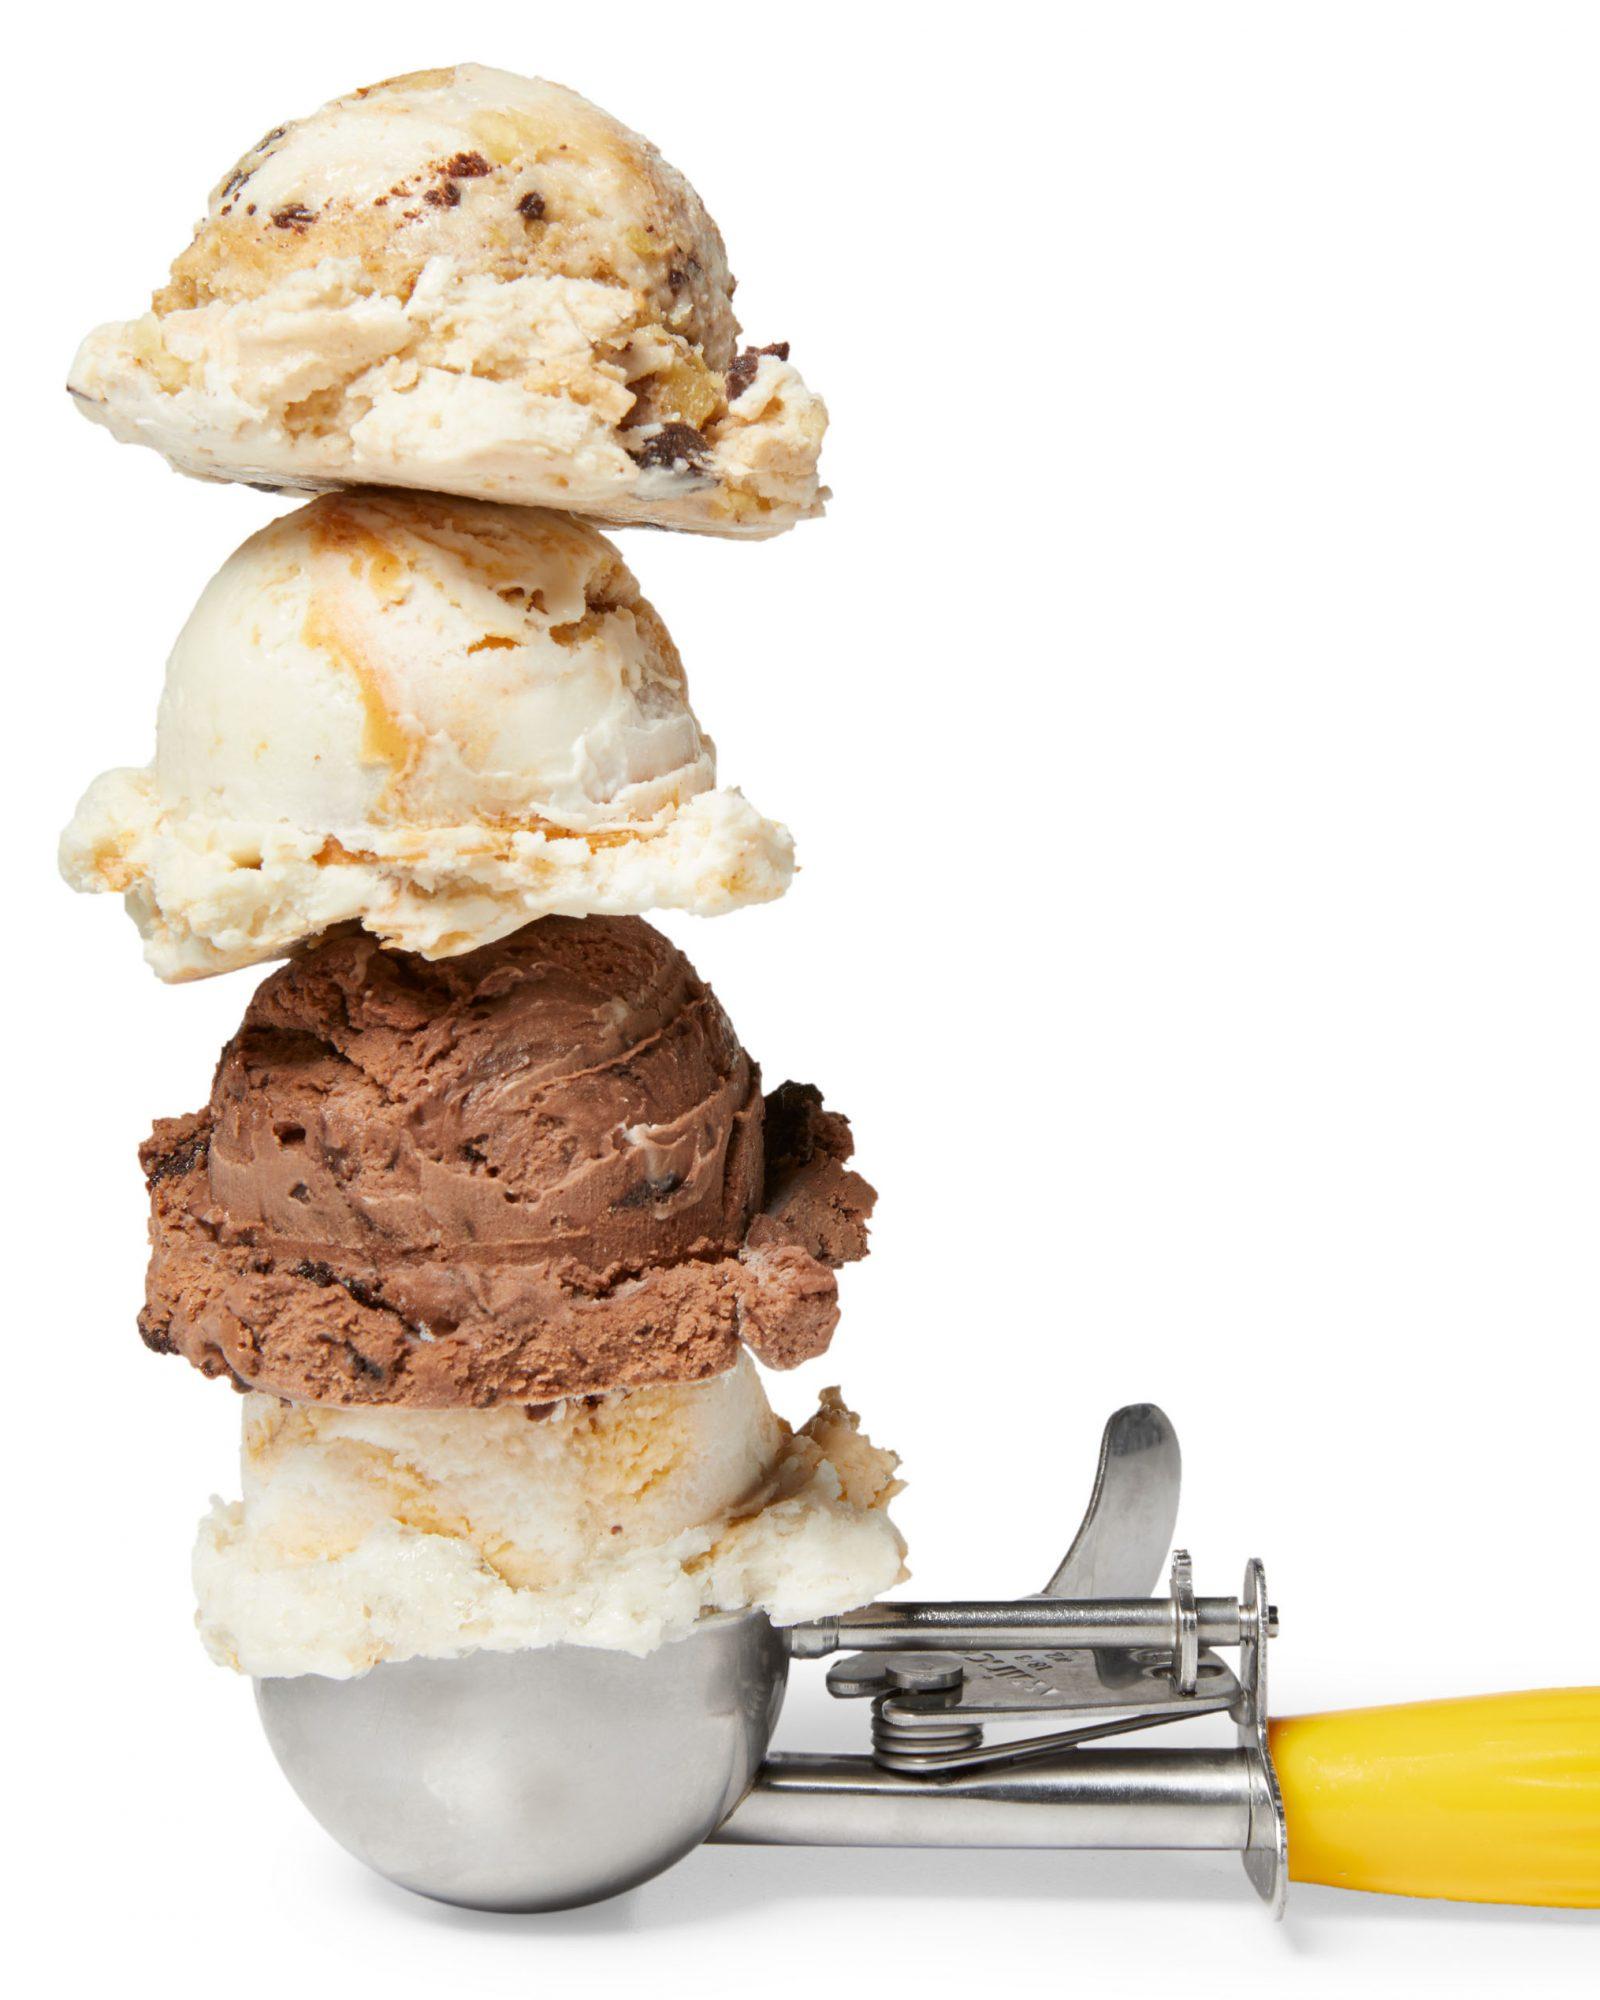 non-dairy ice cream scoops